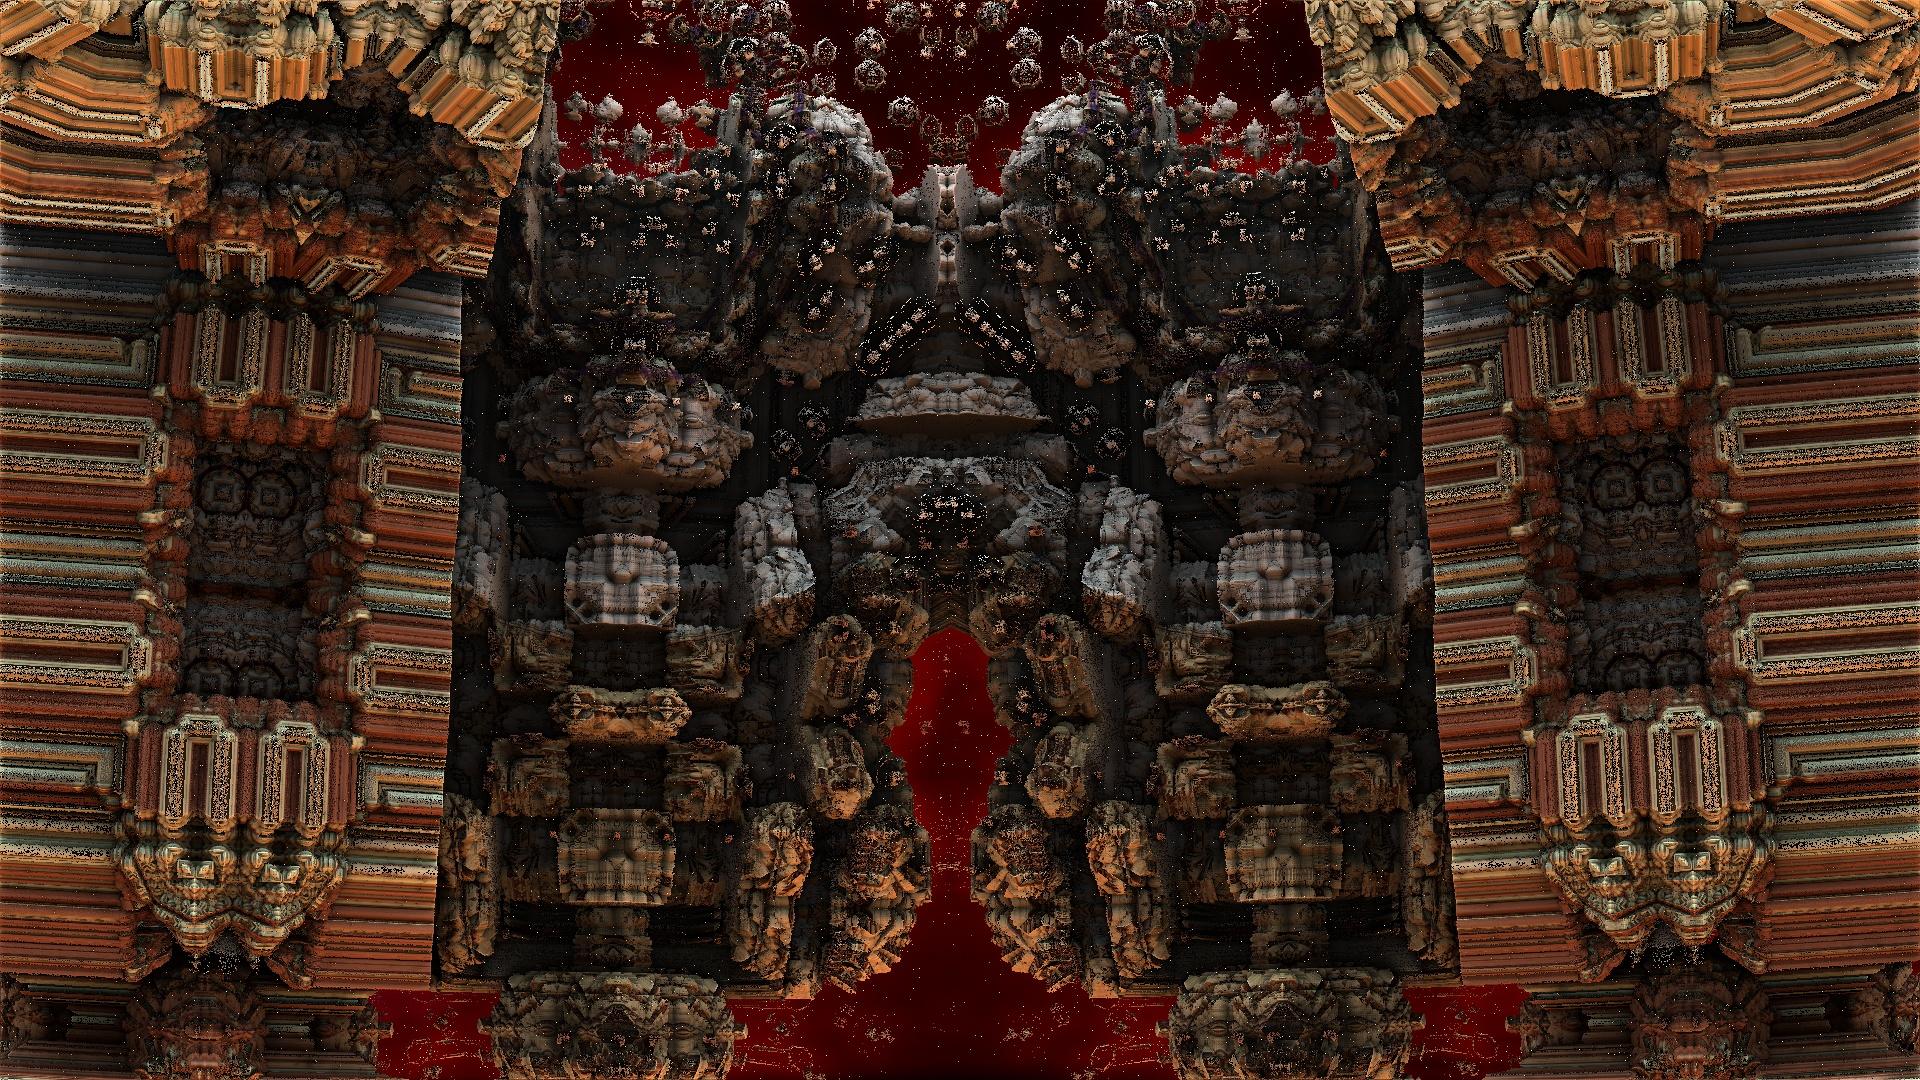 tecno tronic by Topas2012